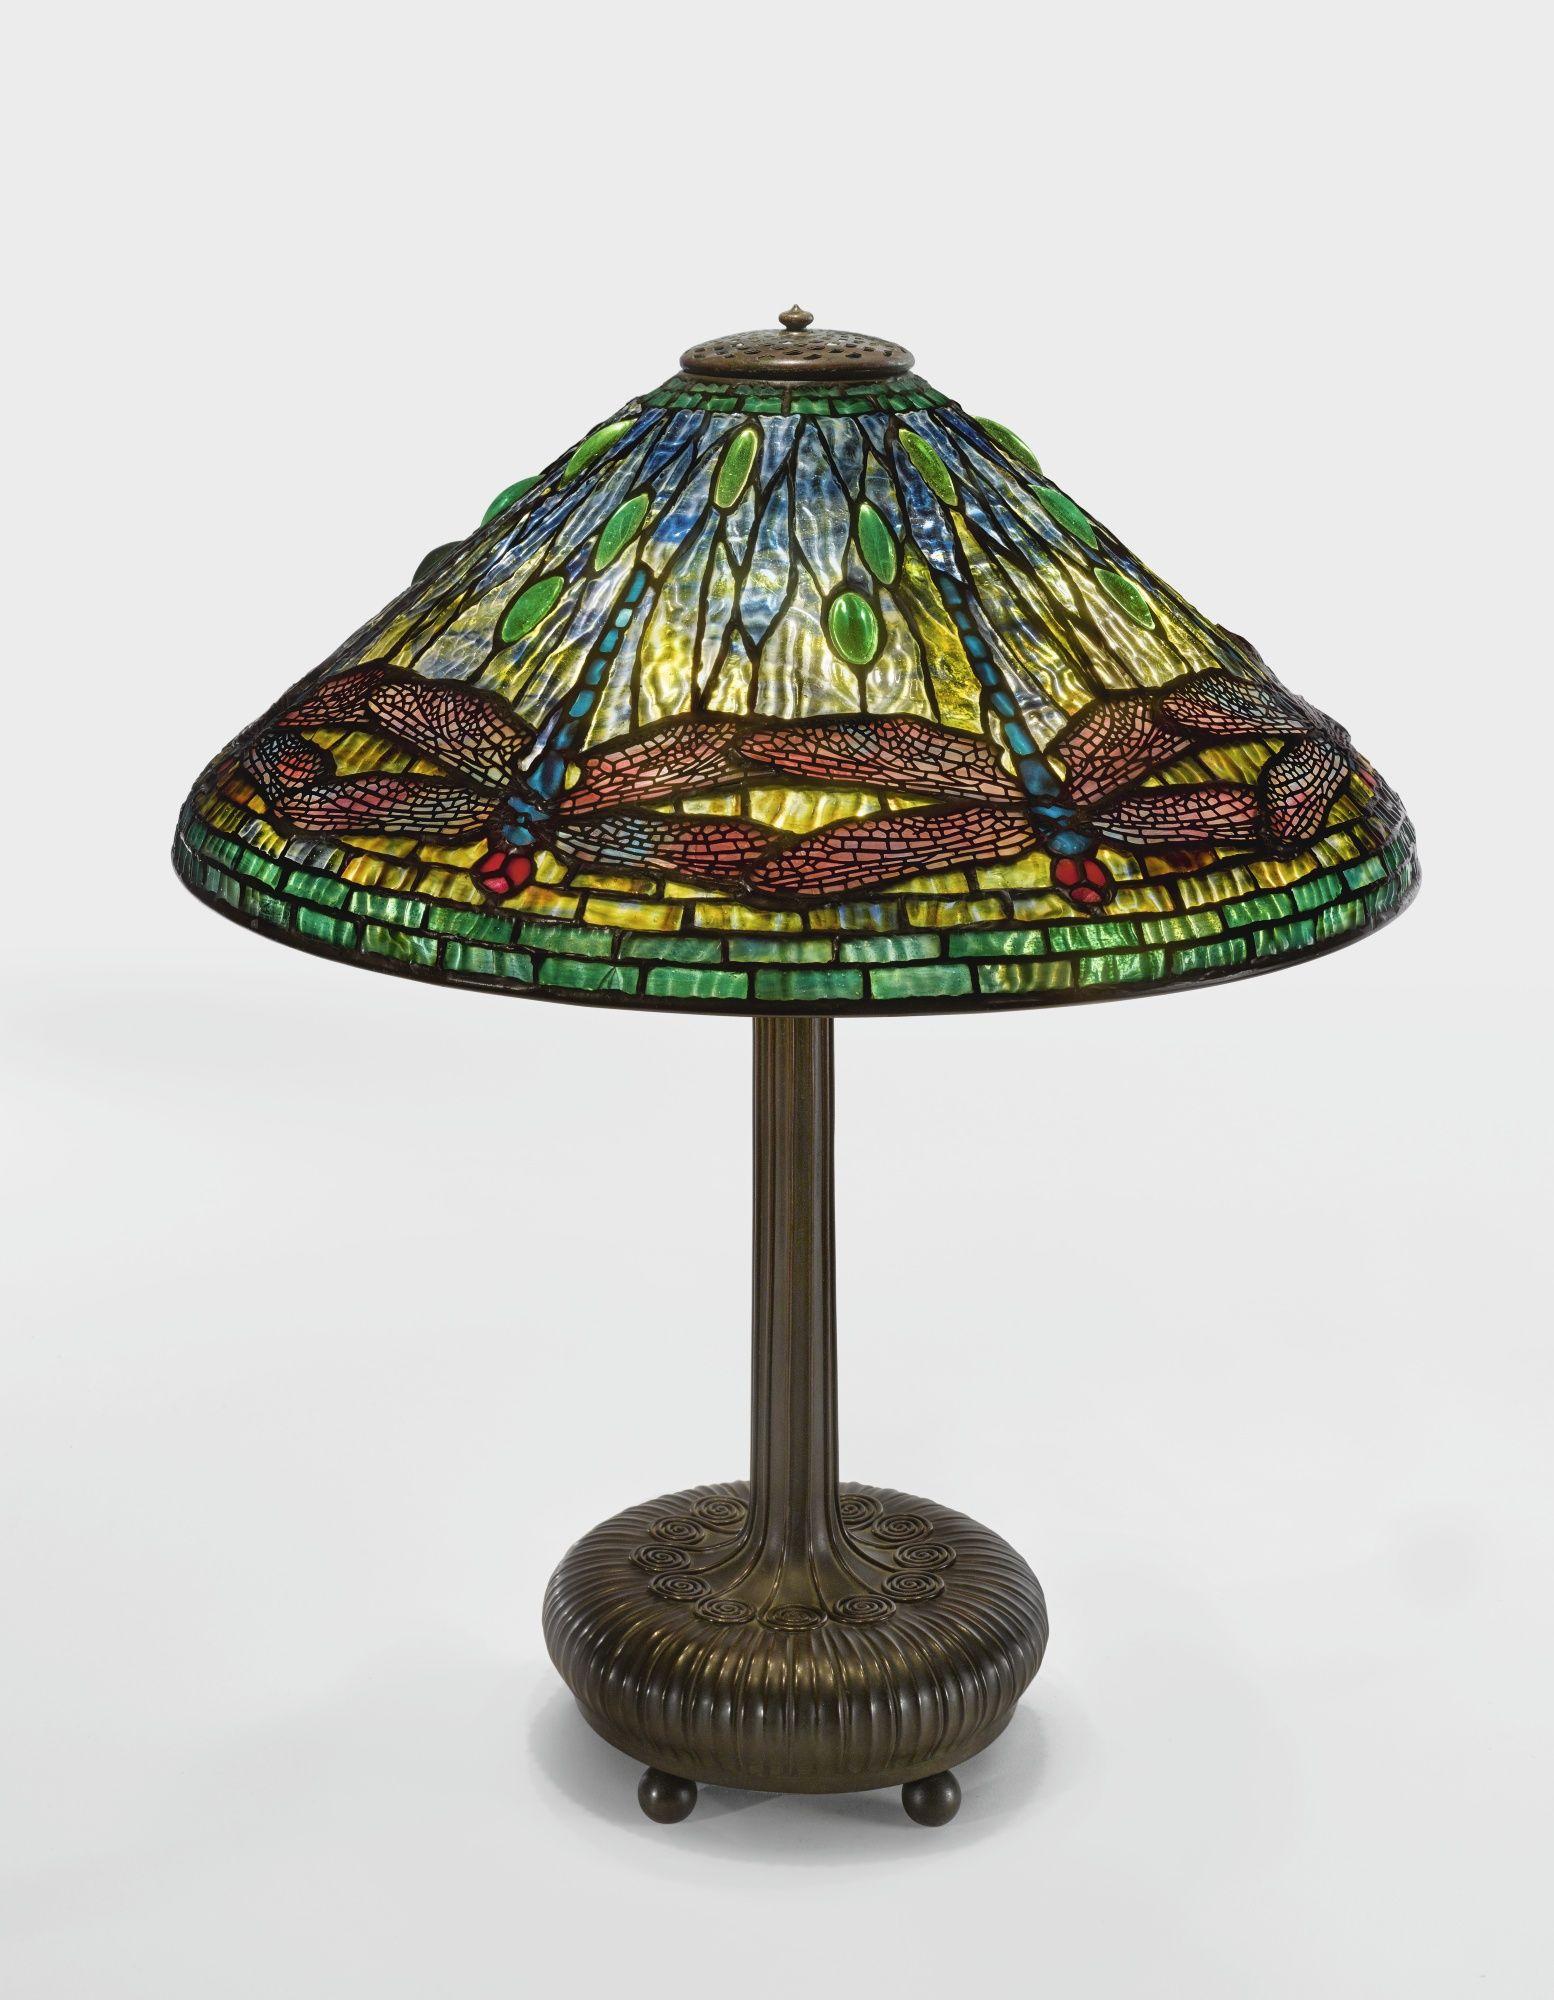 Tiffany Studios Dragonfly Table Lamp Base Impressed Tiffany Studios New York 362 S175 And Impressed 4 Leaded Glass And Lamp Table Lamp Table Lamp Lighting